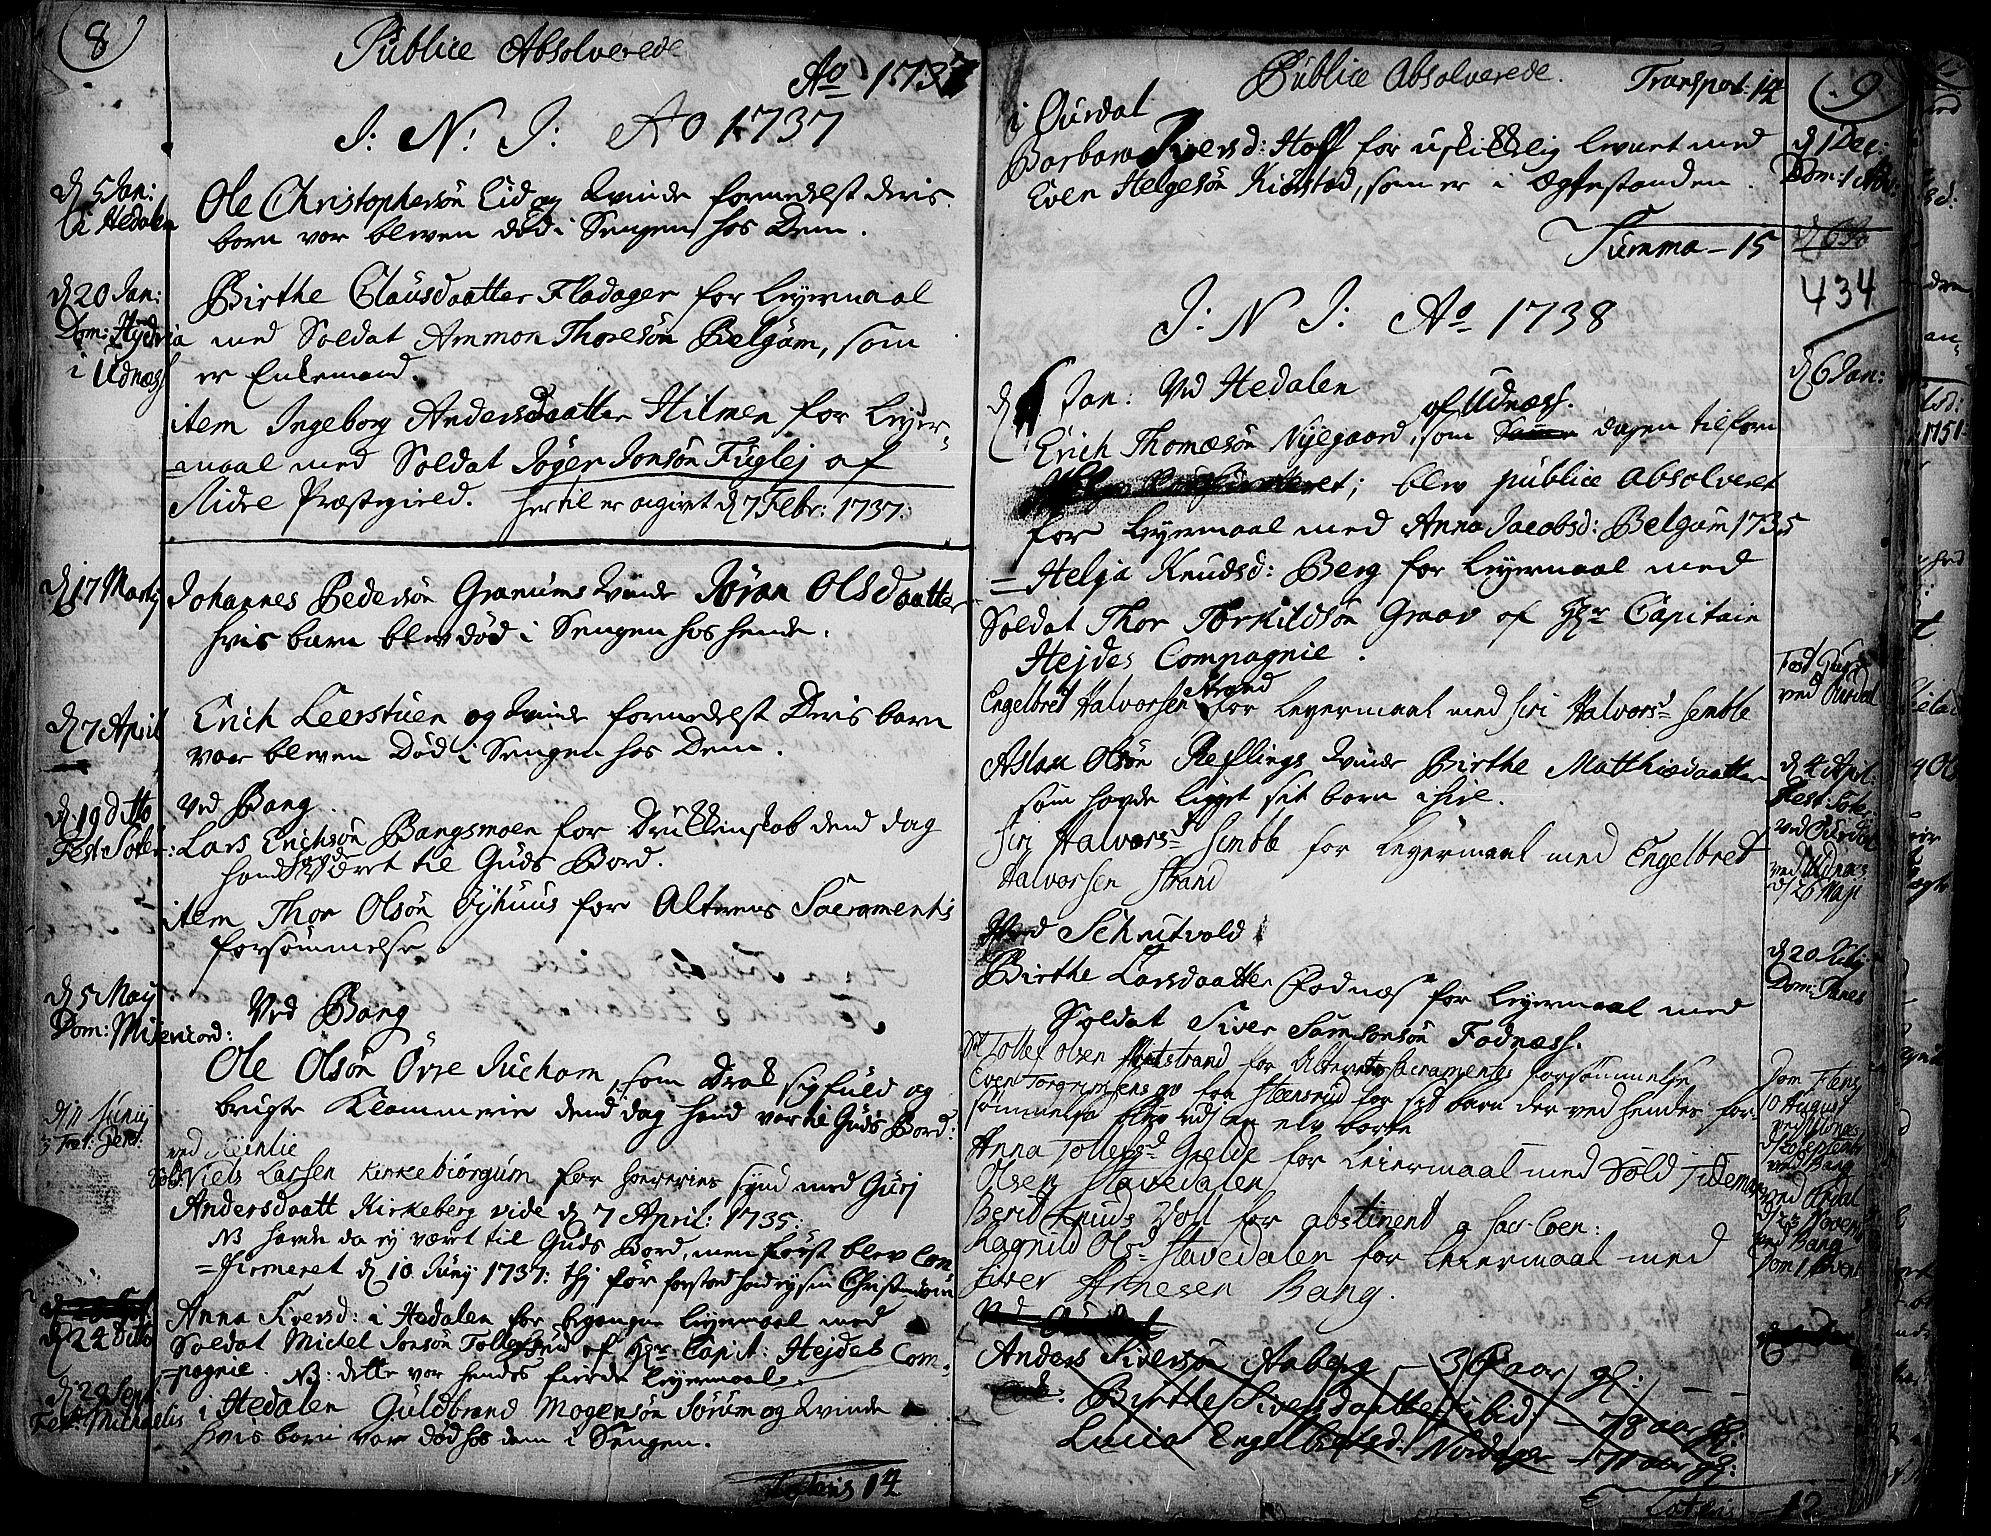 SAH, Aurdal prestekontor, Ministerialbok nr. 4, 1730-1762, s. 8-9